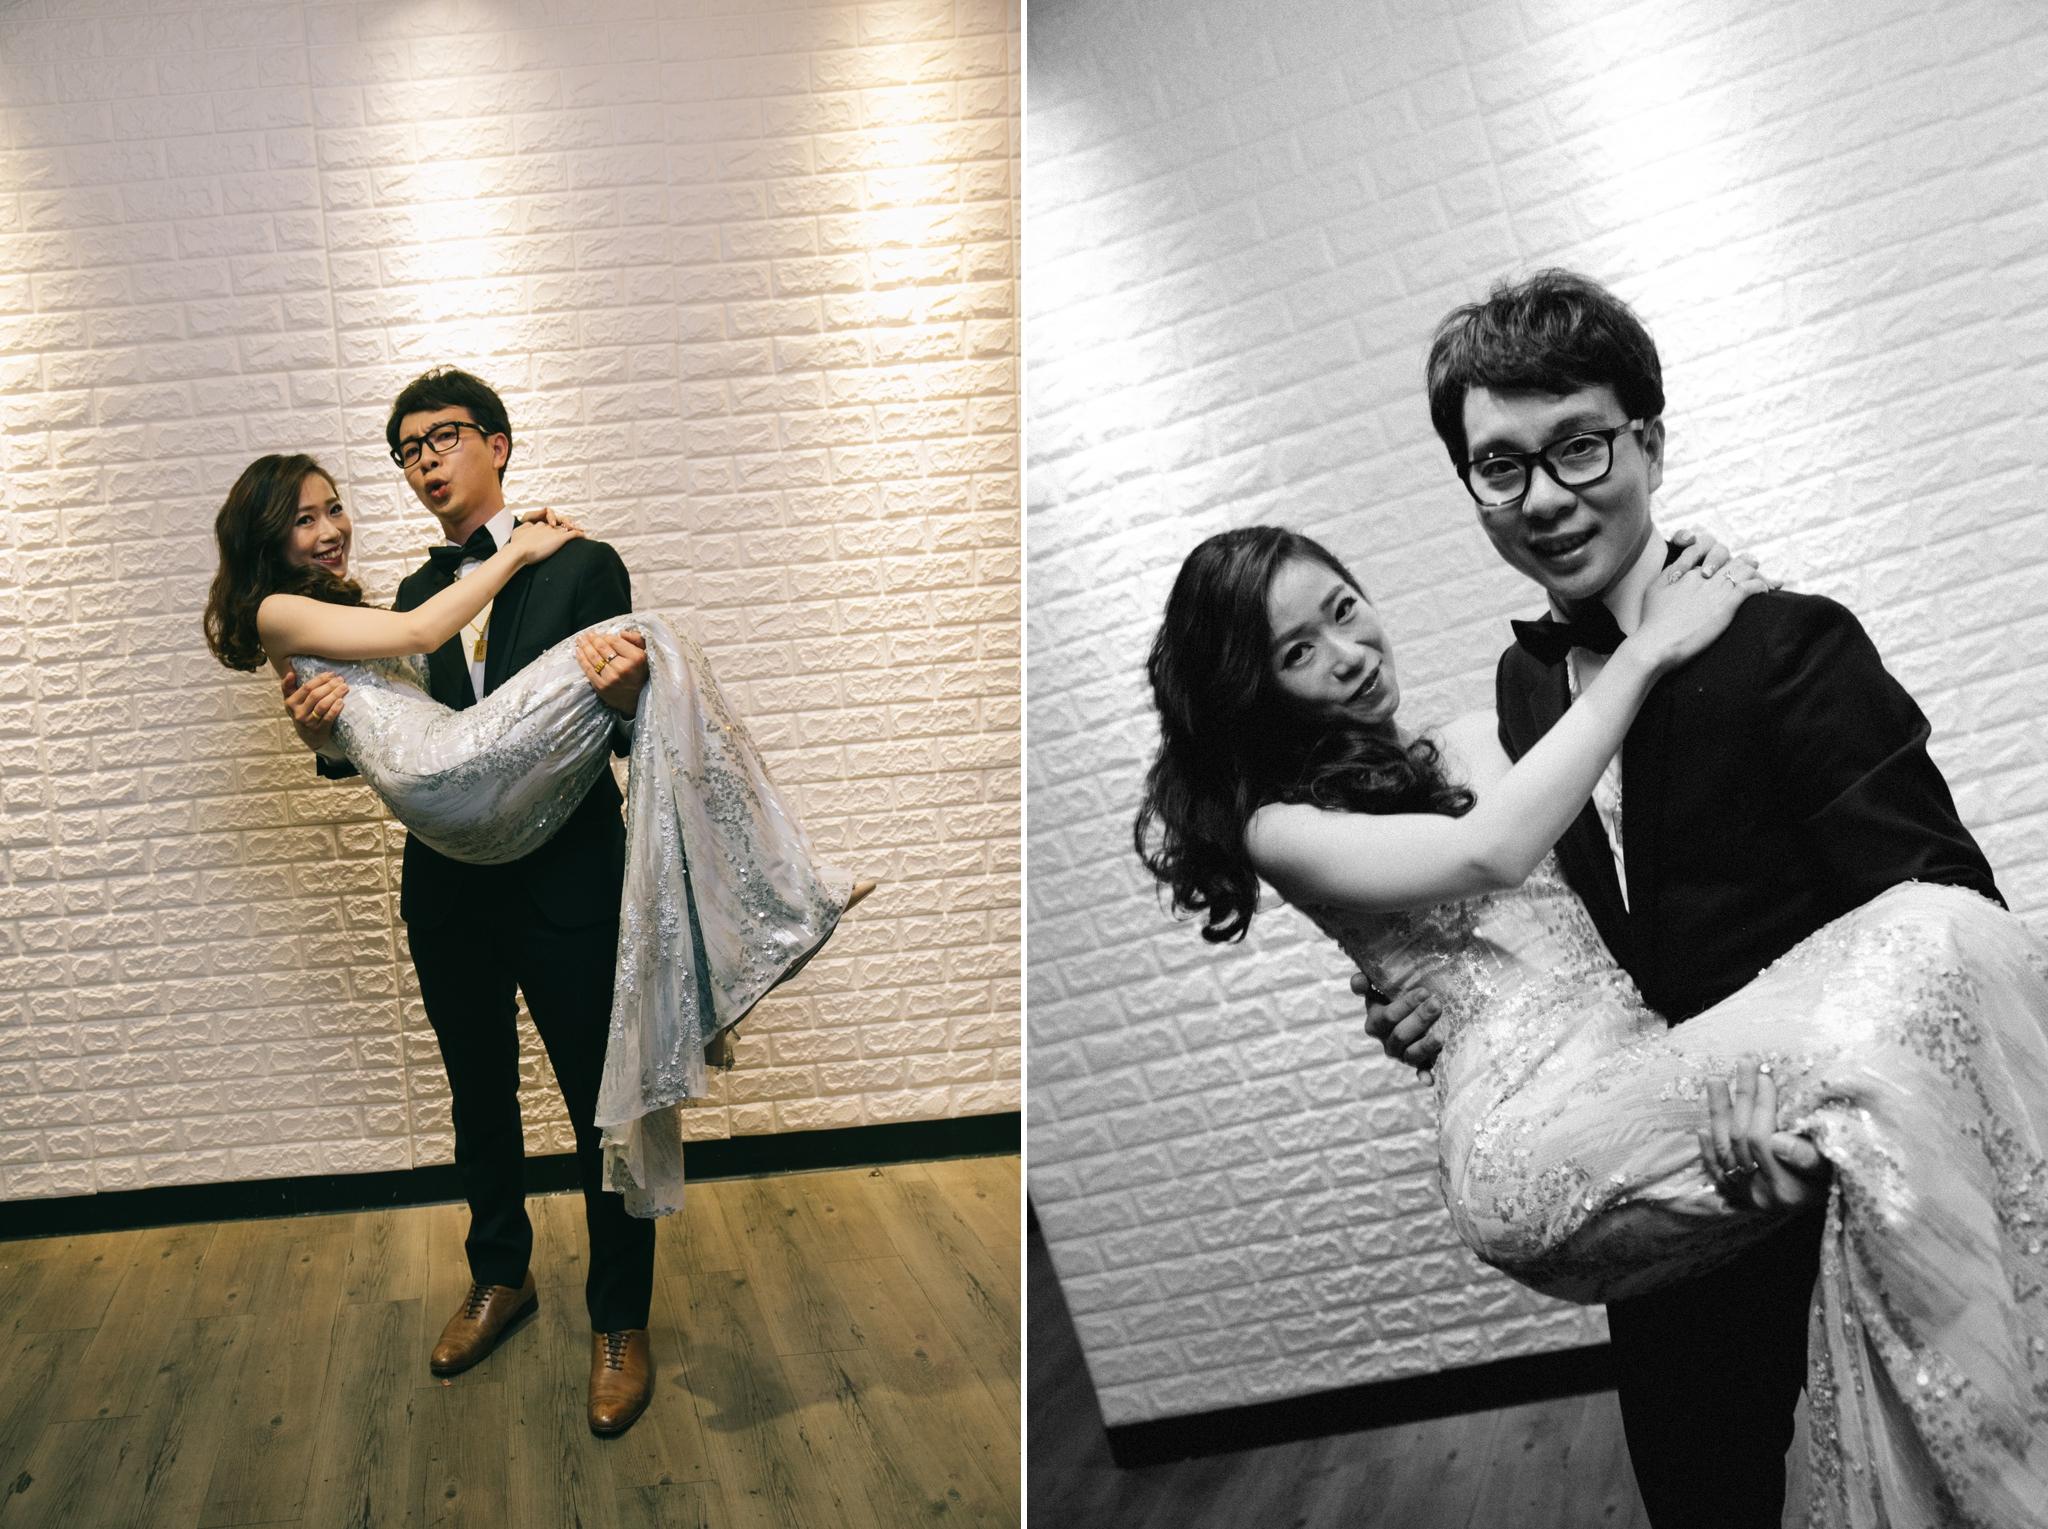 Tina+Nash-wedding-台北婚禮迎娶晚宴-新莊終身大事-164.jpg